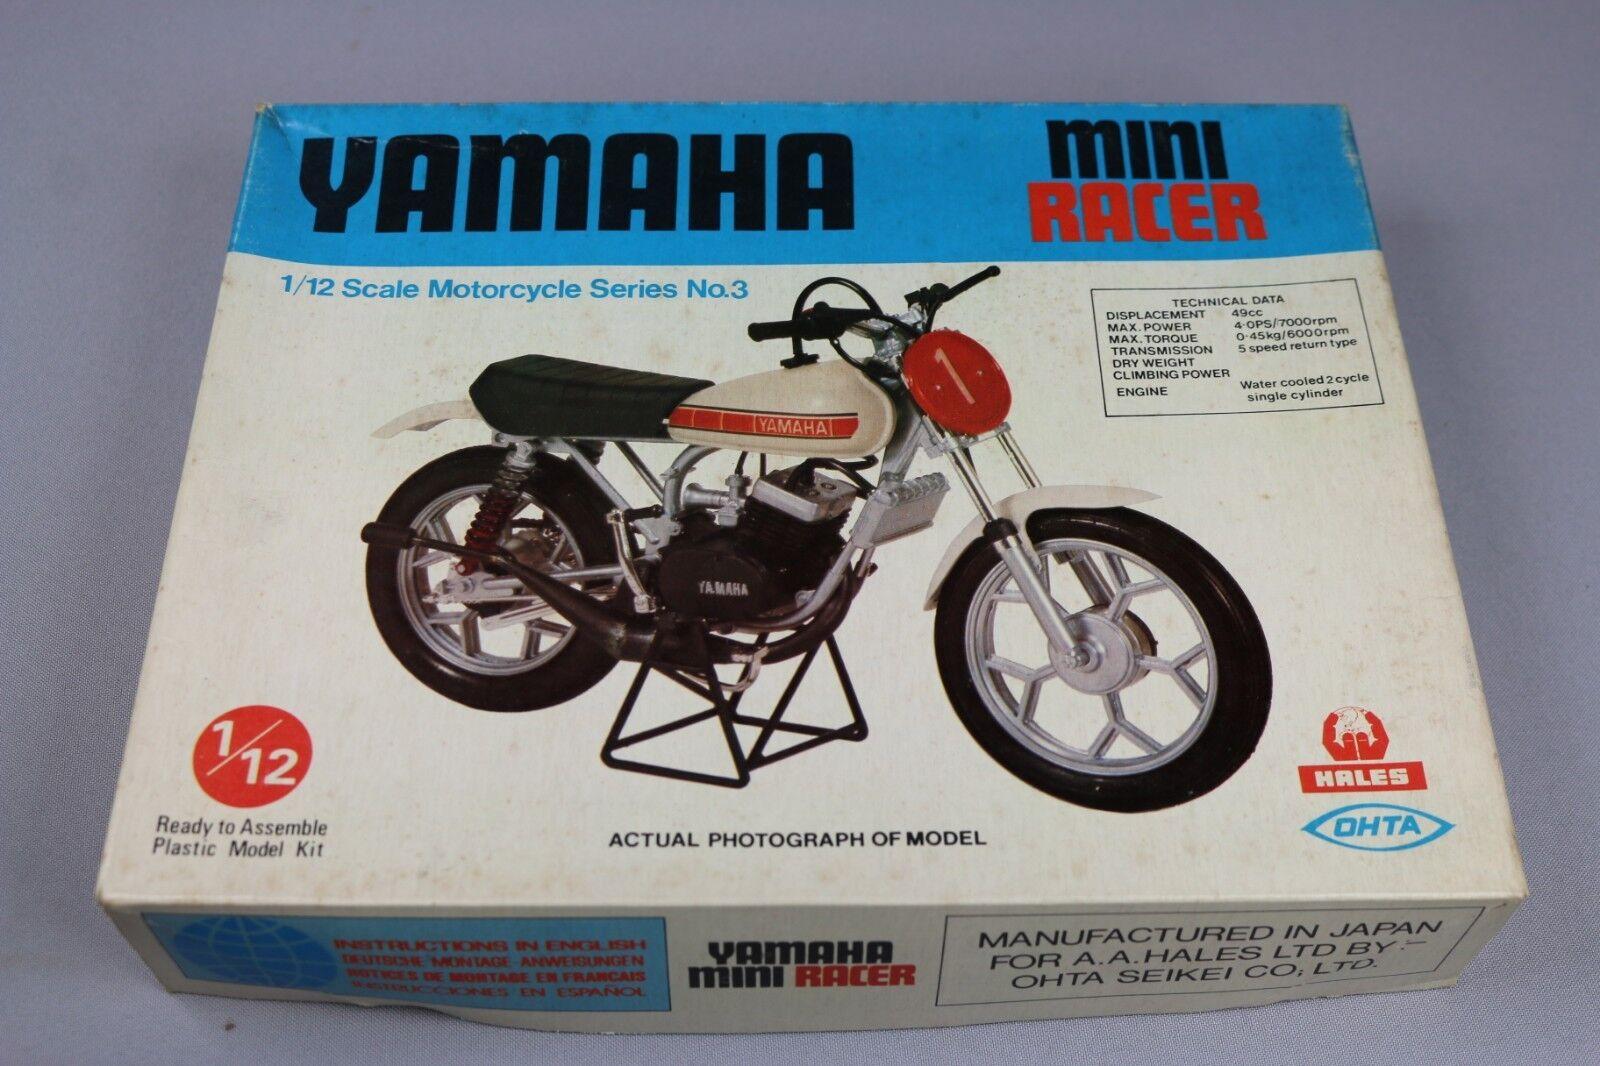 Zf1029 Hales Ohta 1 12 Modellino Moto M12013 Yamaha Mini Racer 2 Strokes